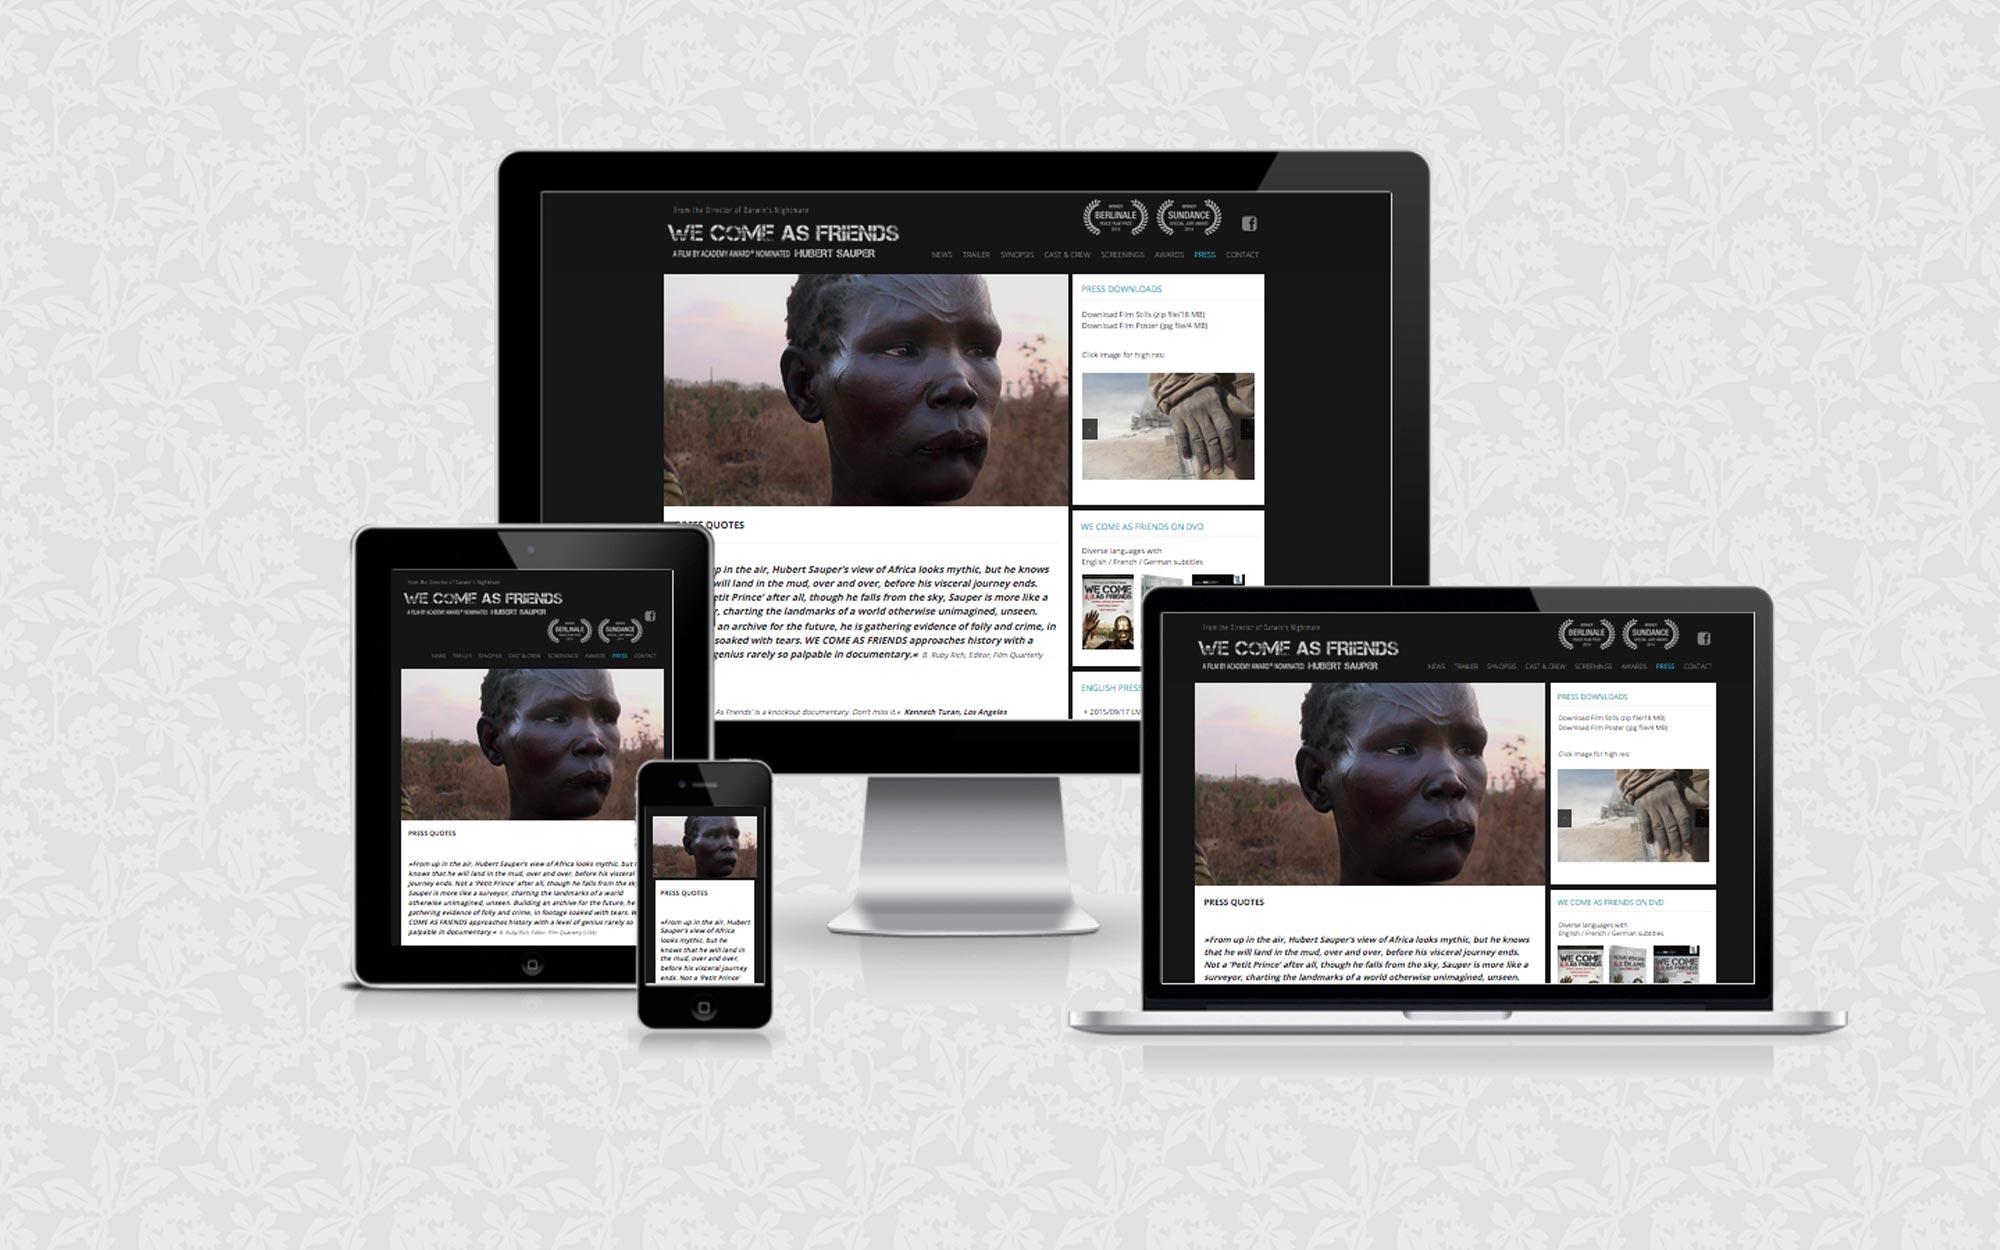 Filmwebsite für We Come as Friends